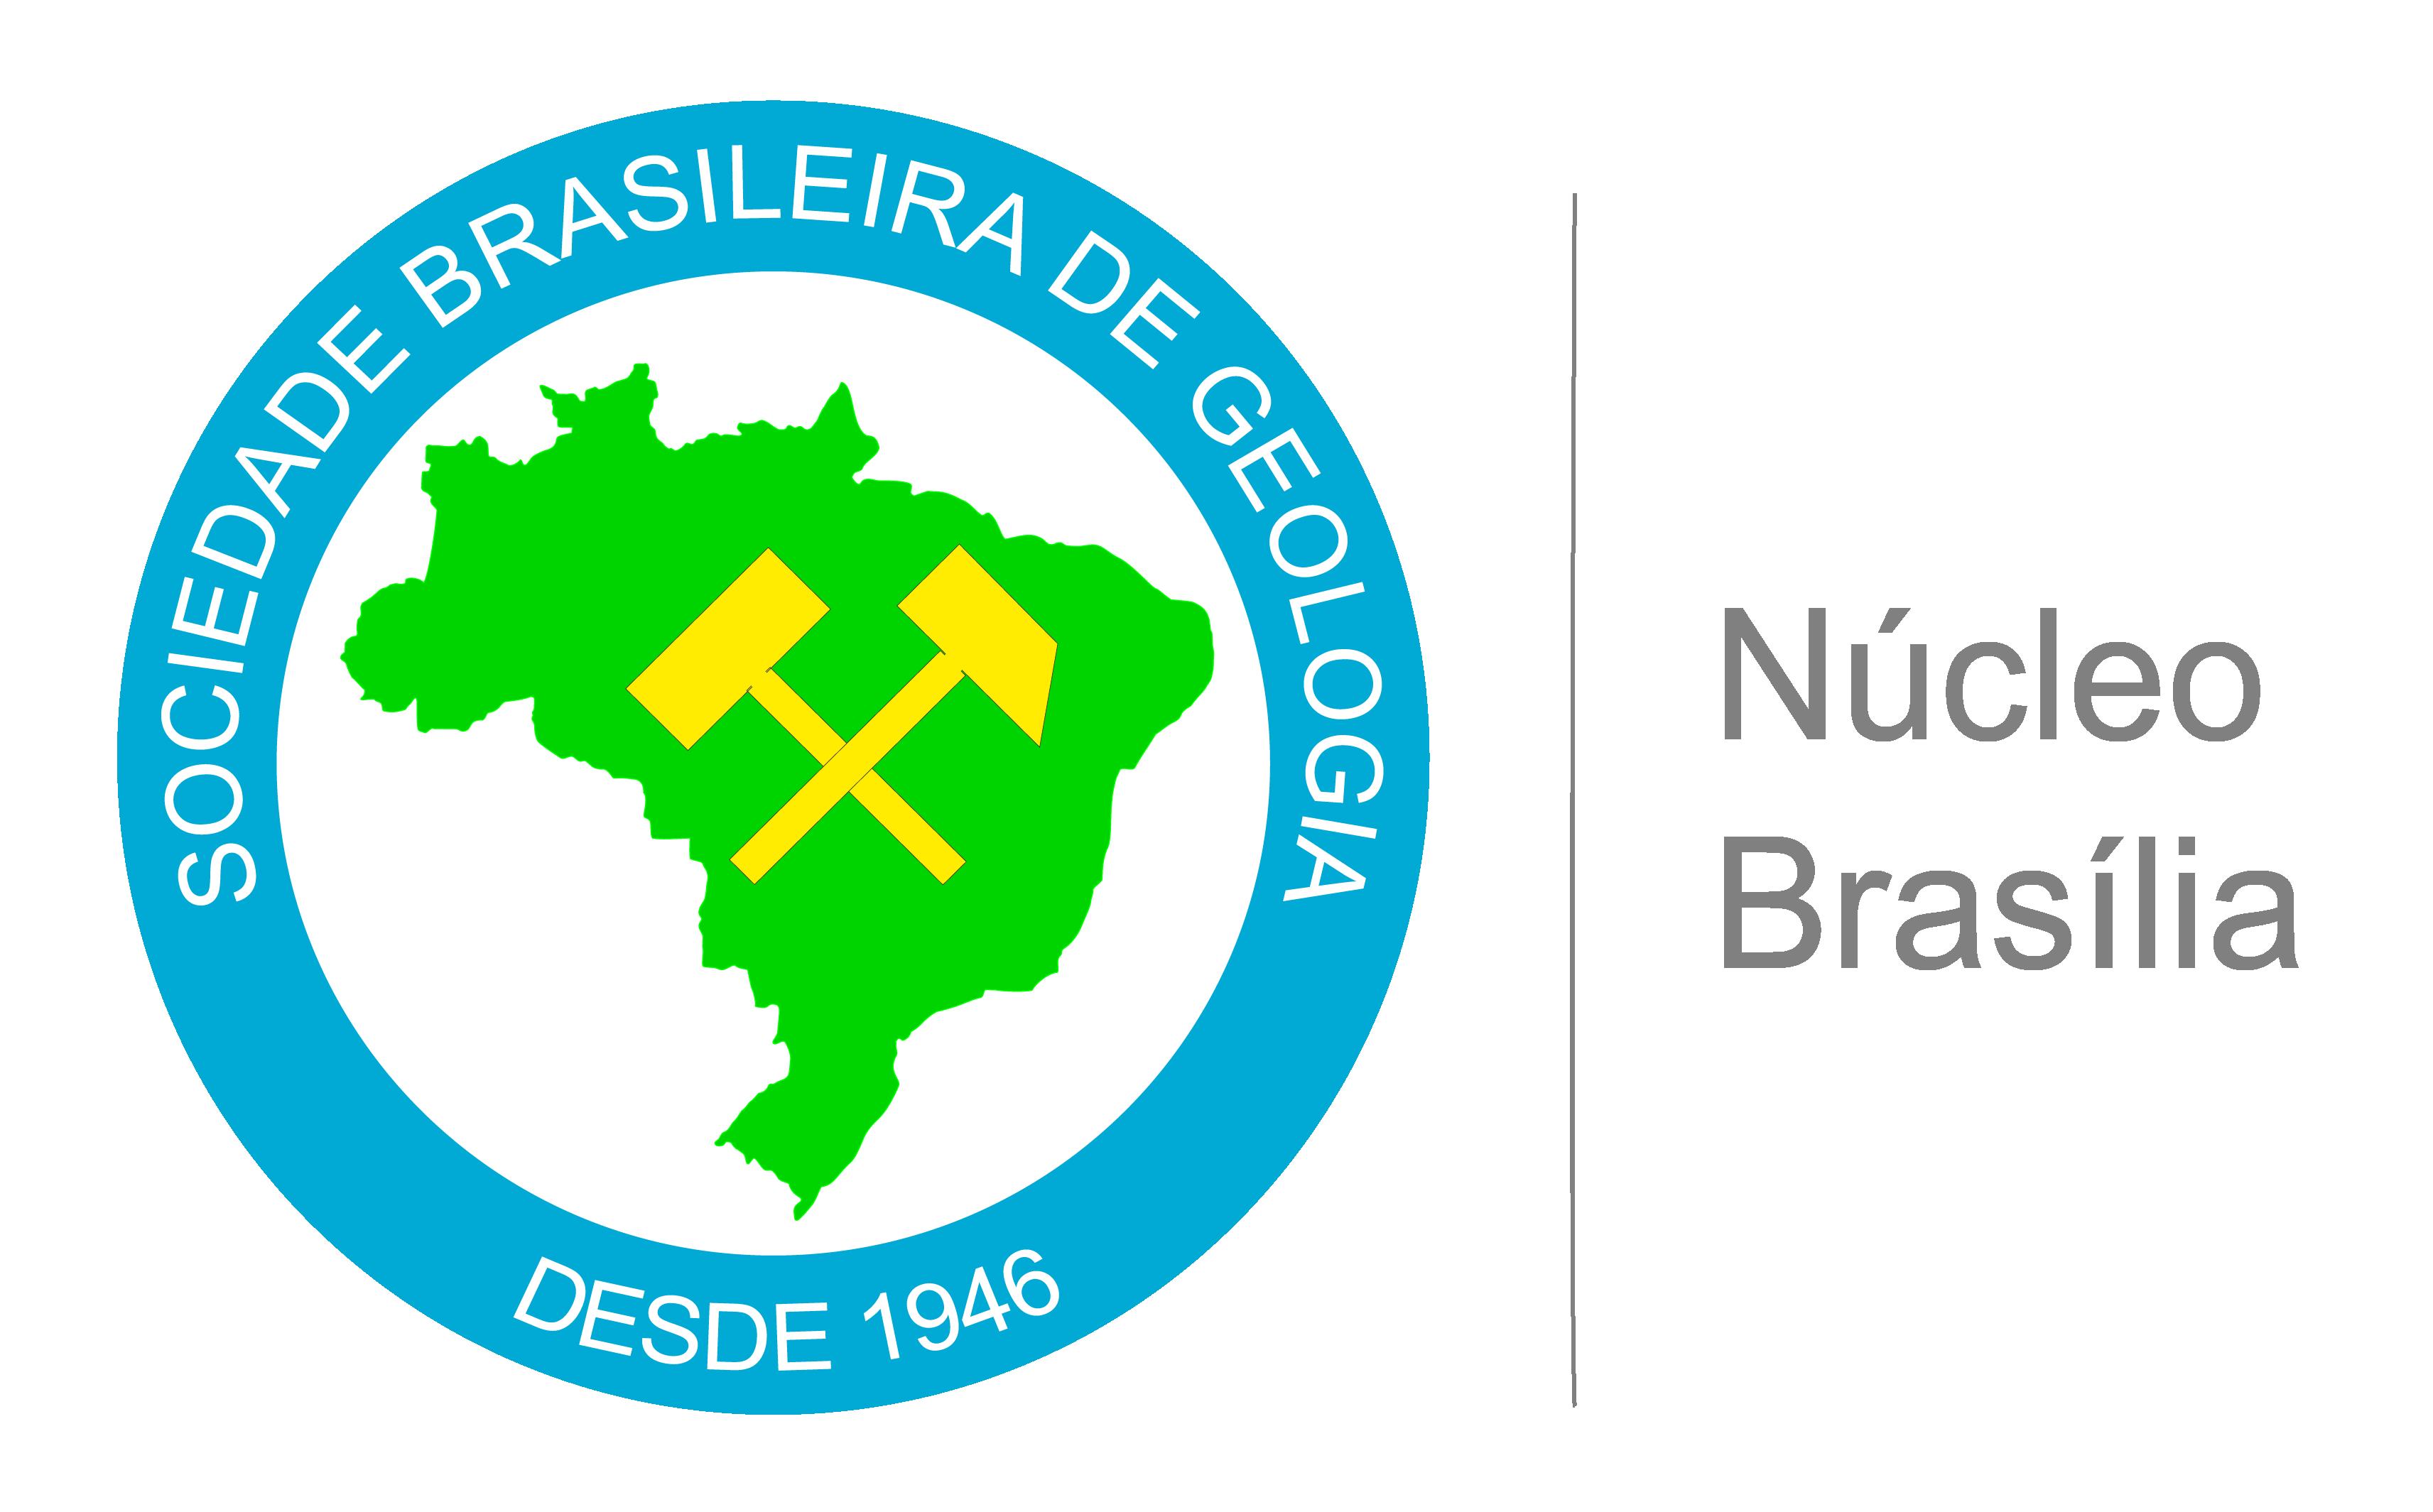 Sociedade Brasileira de Geologia - Núcleo Brasília